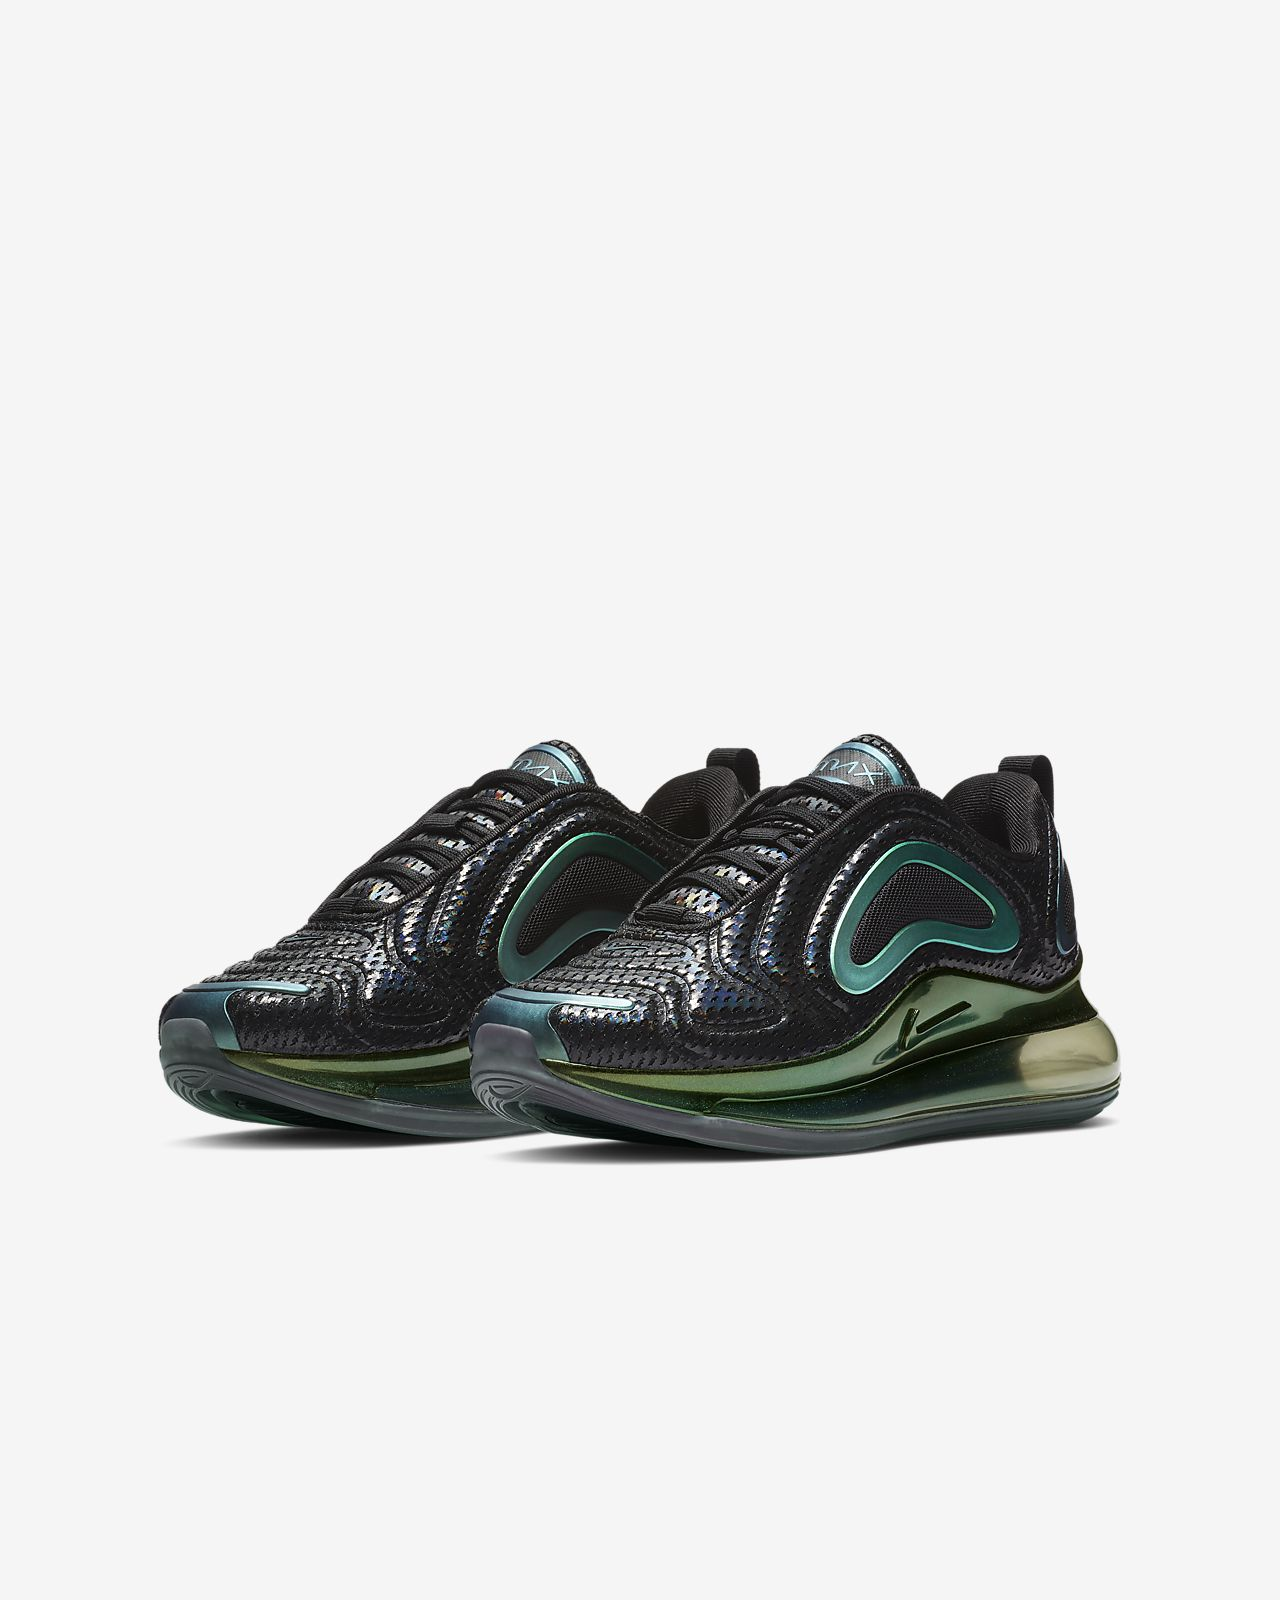 Nike Air Max 90 Leather Schuh für jüngere Kinder. Nike BE